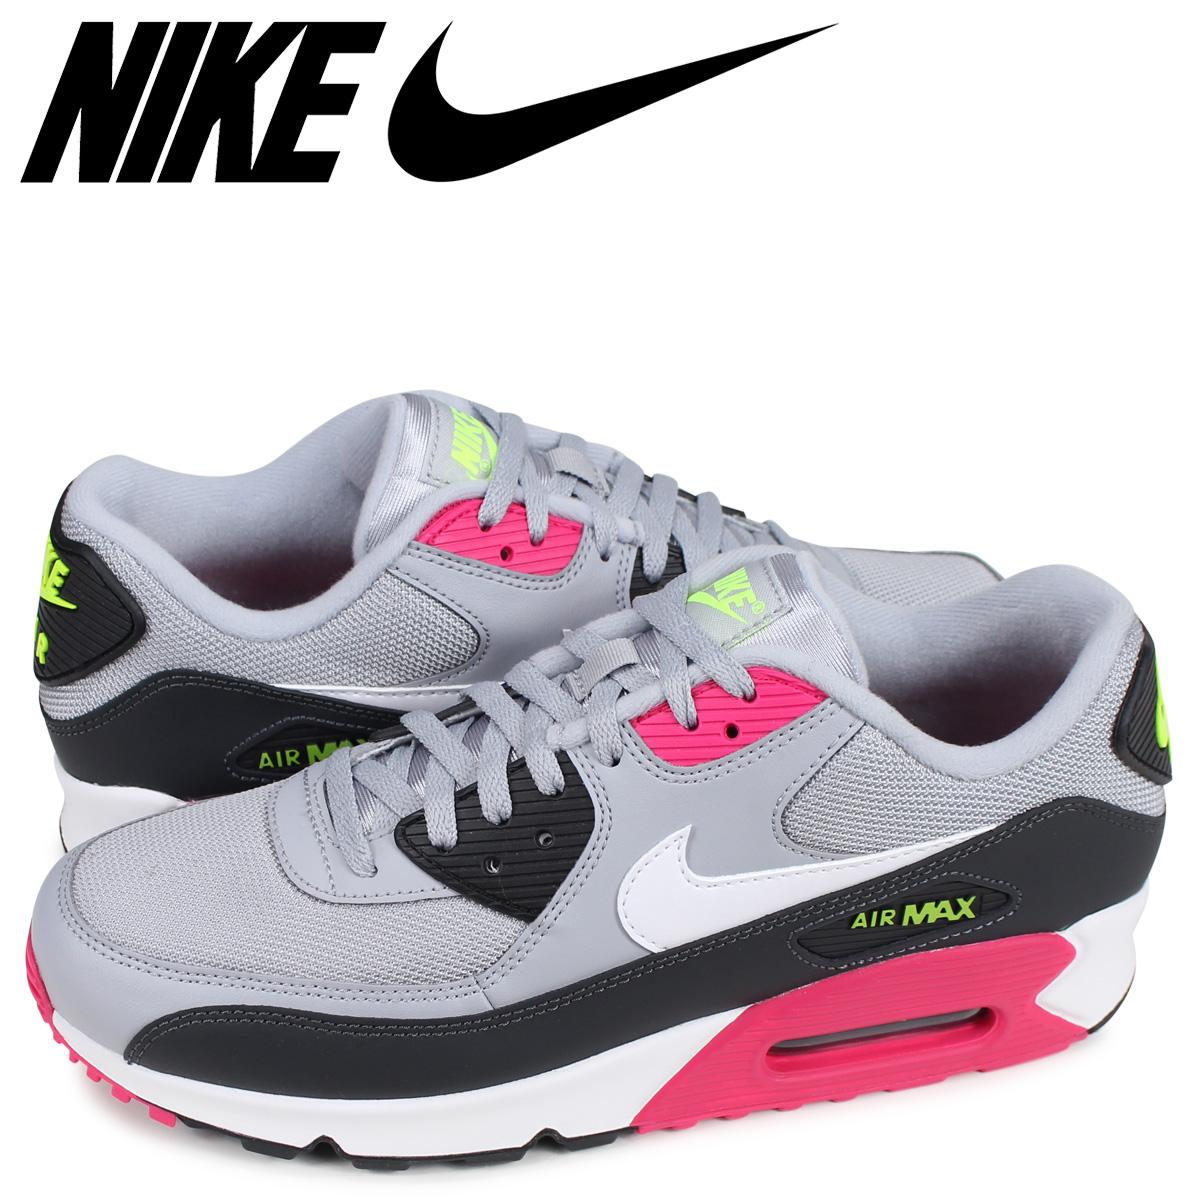 Nike Air Max 90 Essential Men/'s Size 13 Grey Gray Shoes AJ1285-020 New